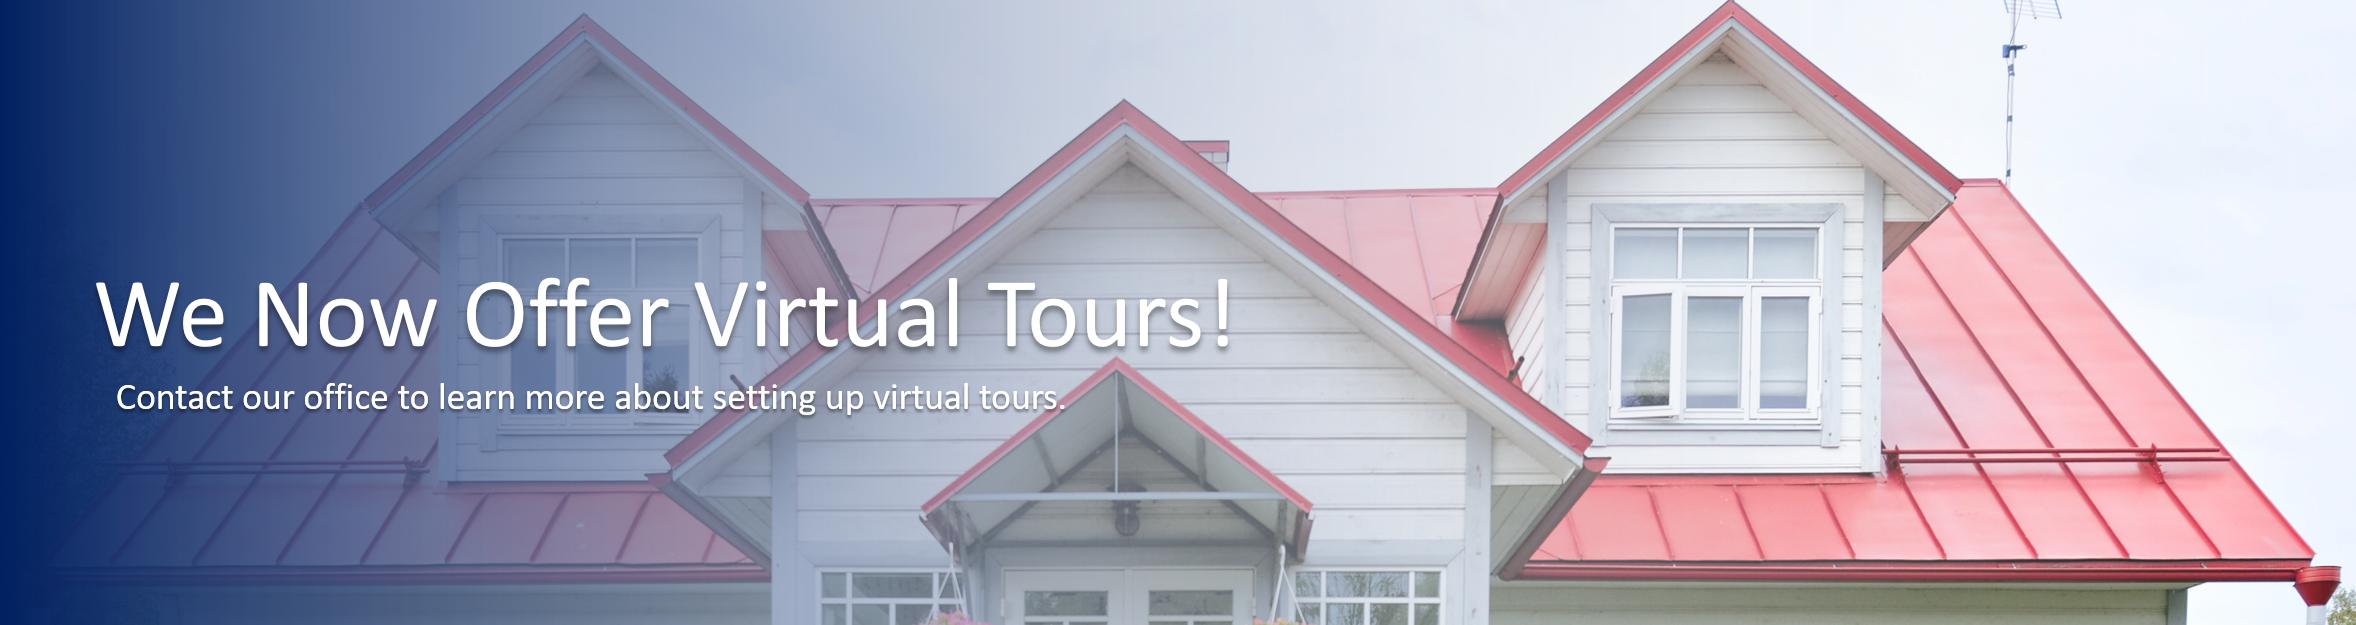 RPM AllStars Offers Virtual Tours